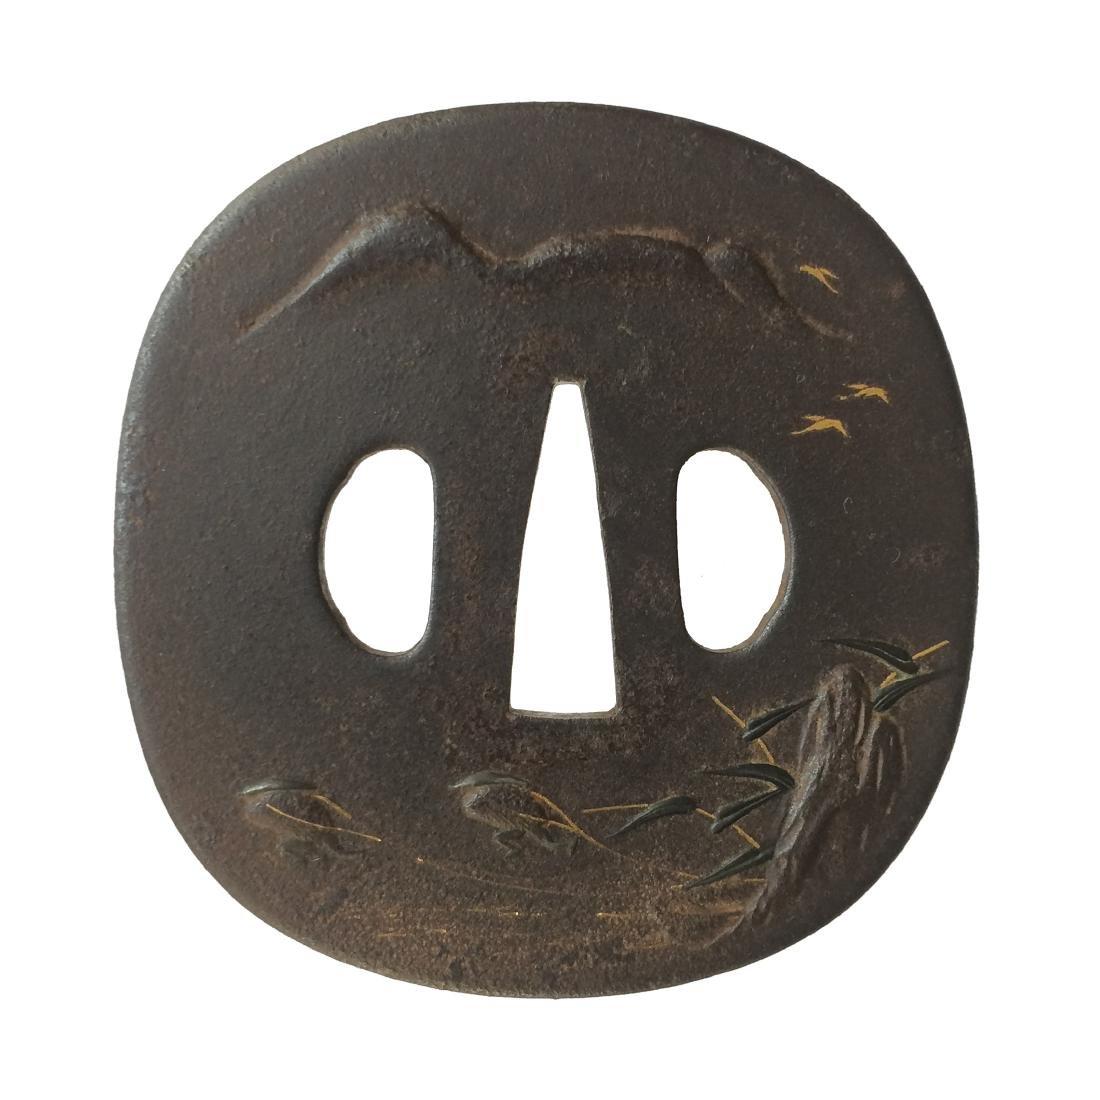 Iron tsuba with gold inlay